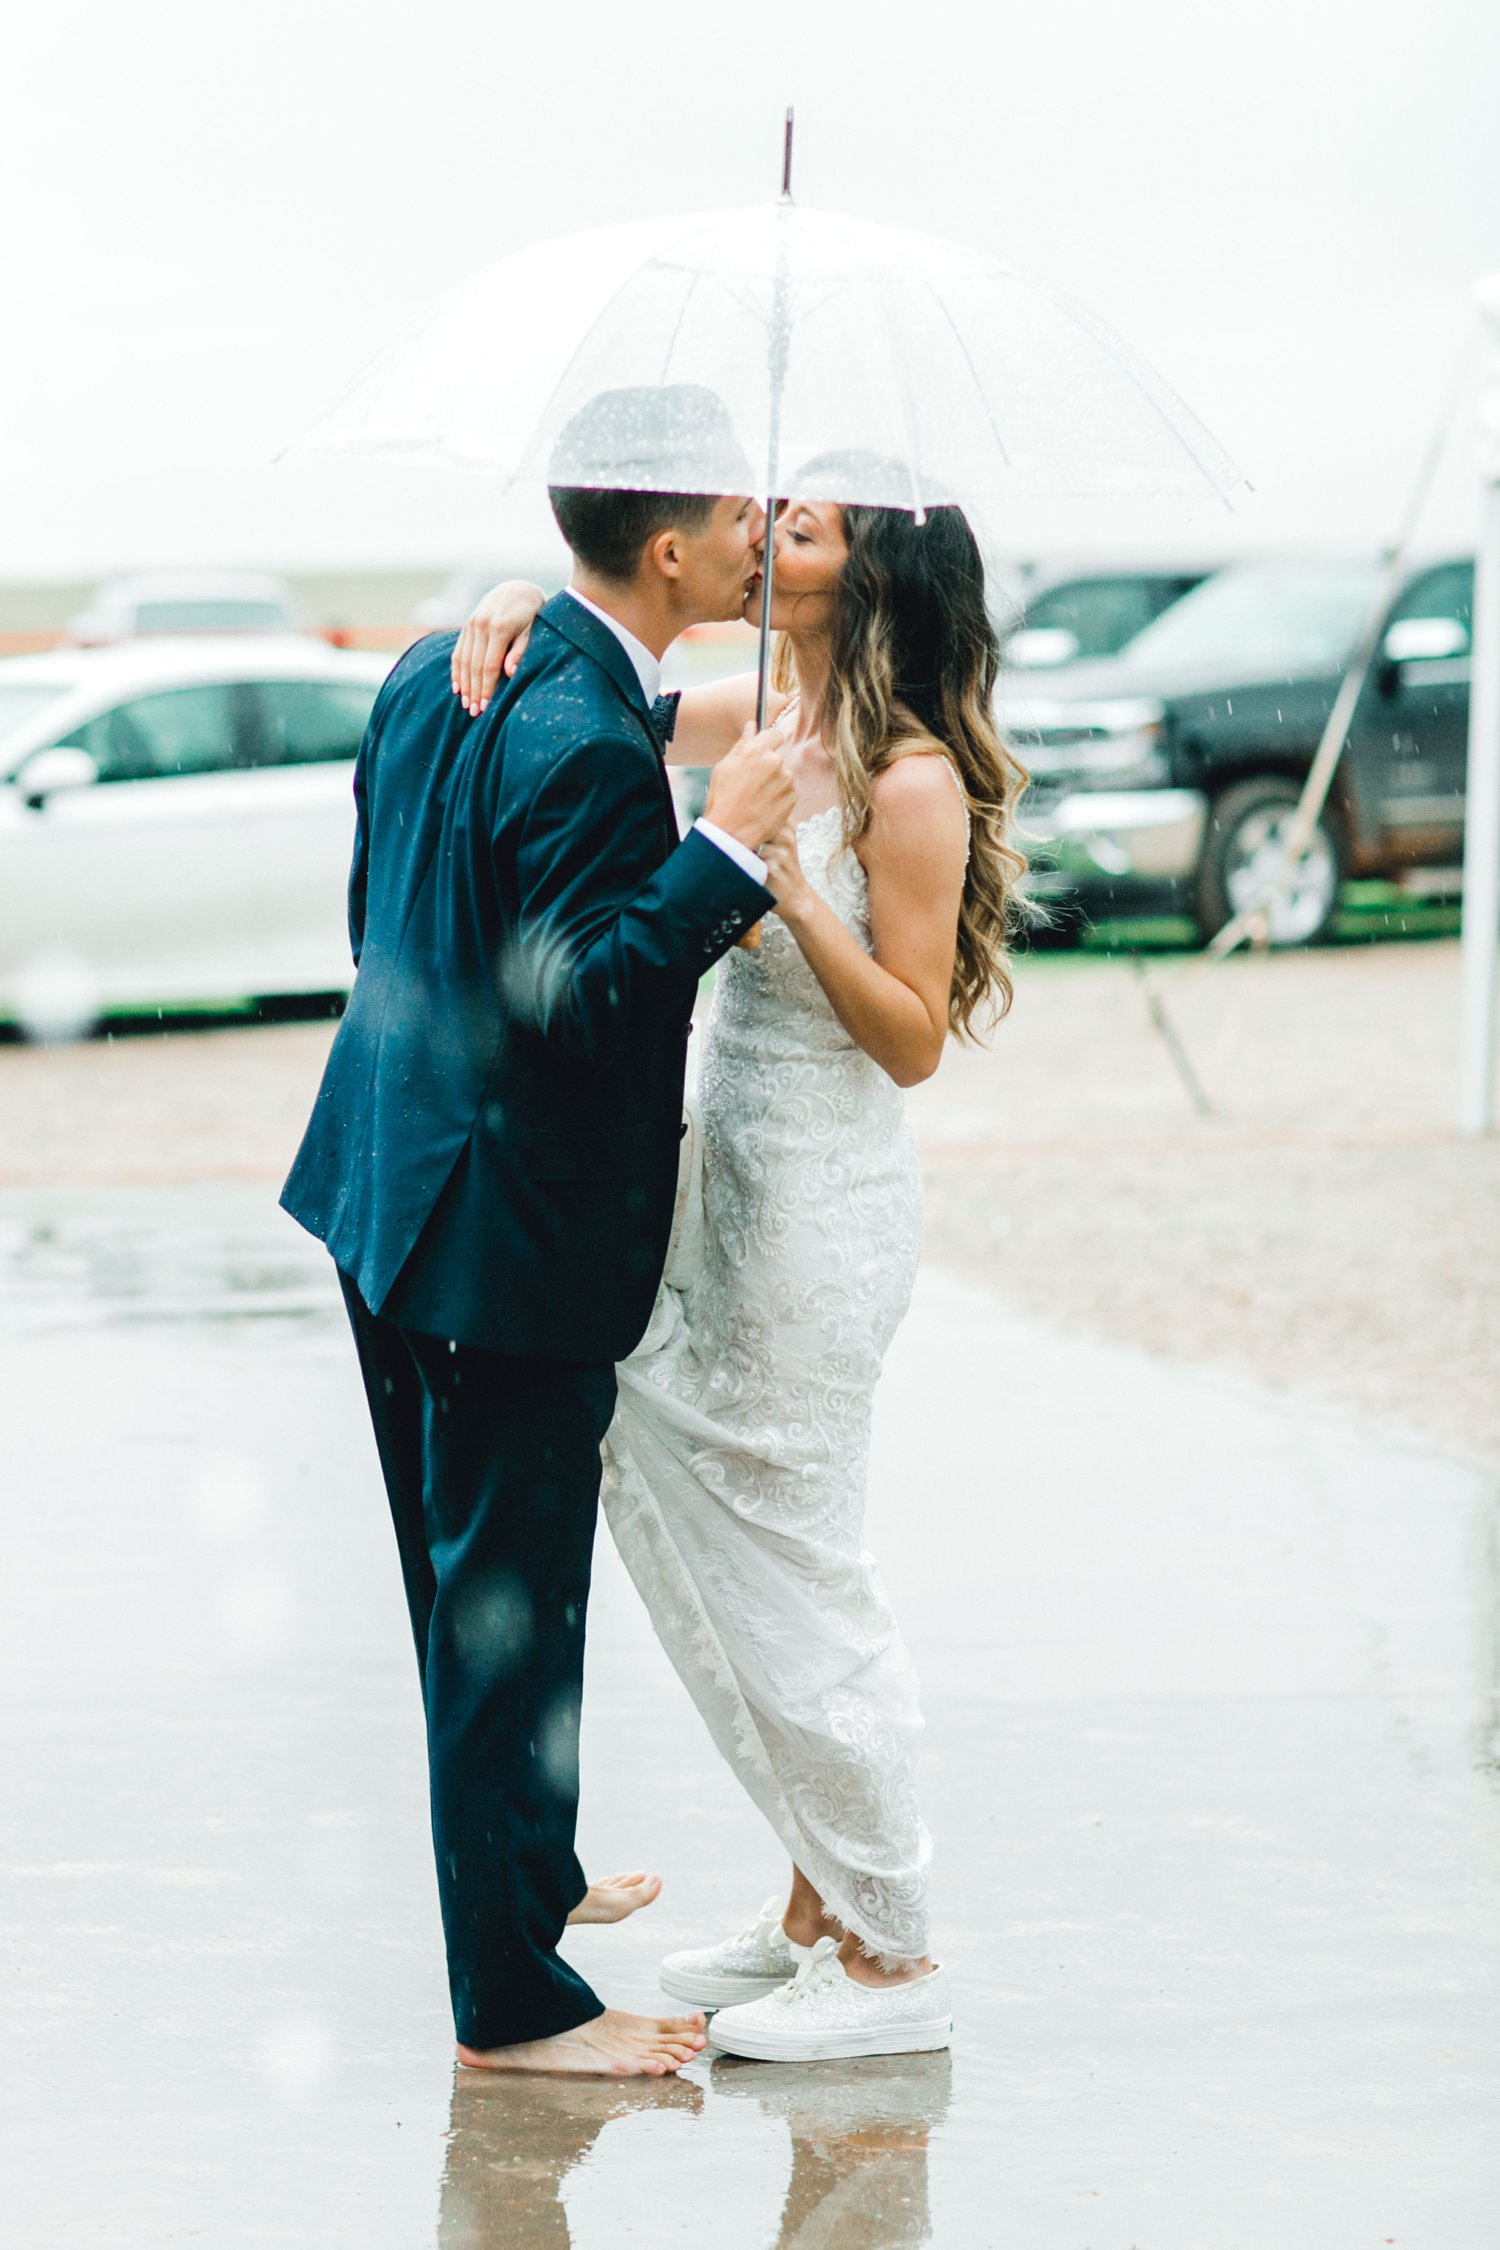 Ashley_John_English_Elegant_Texas_Wedding_Outdoors_Ranch_Caprock_Winery_ALLEEJ_0158.jpg